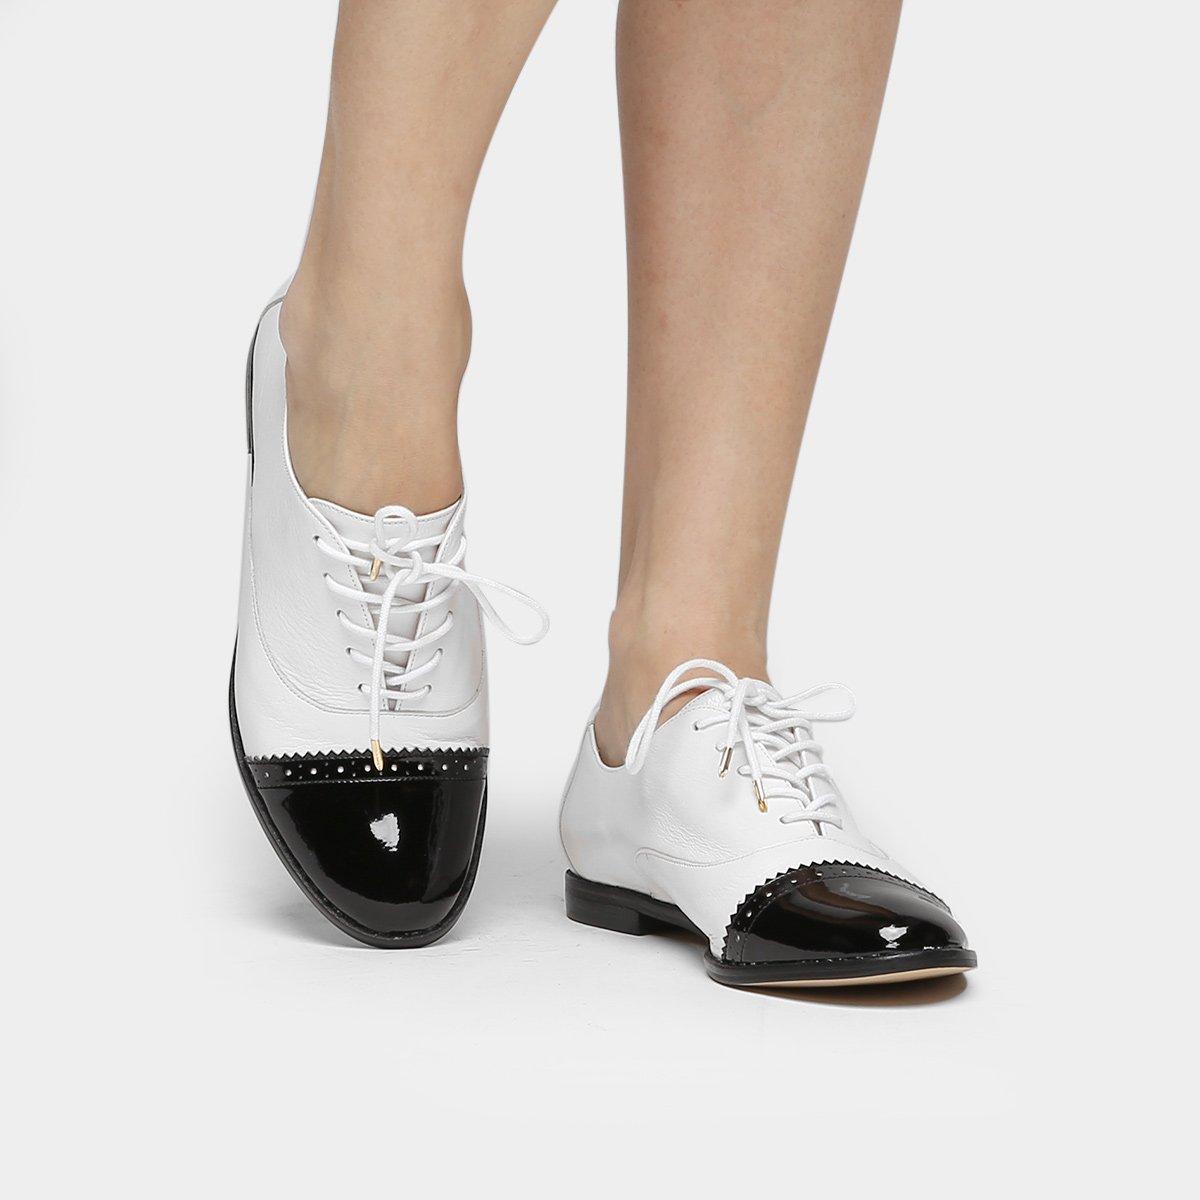 7bcc0da167 Oxford Couro Shoestock Brogues Bicolor Feminino - Compre Agora ...